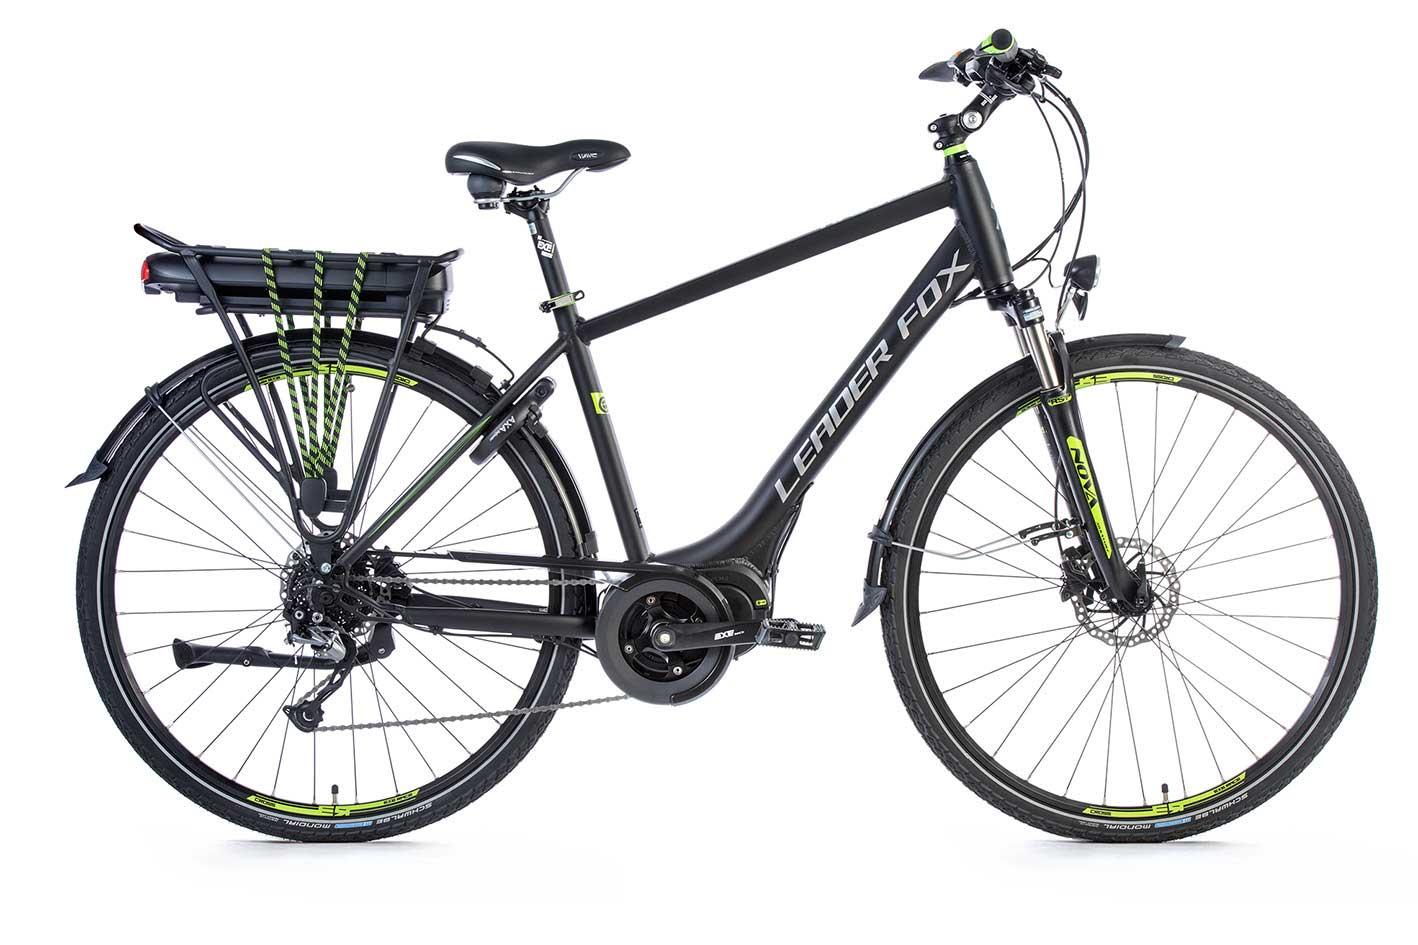 Bicicleta Electrica Leader Fox HASUDA Gent 2018